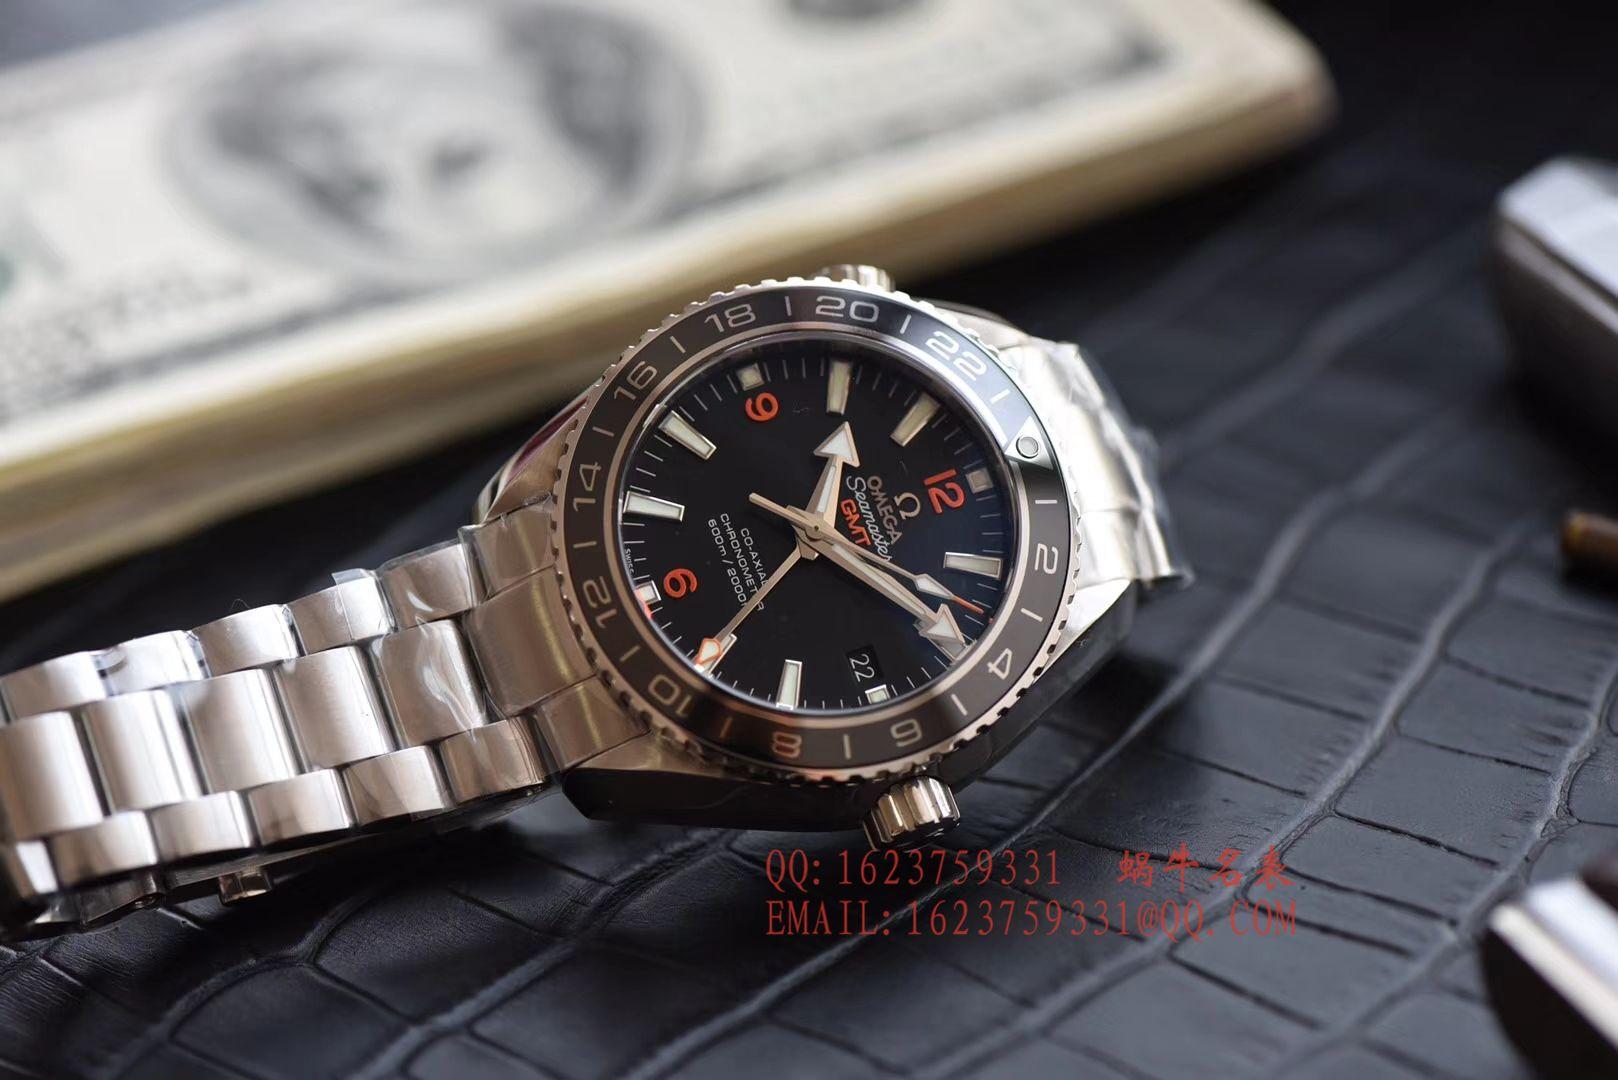 【KW一比一超A高精仿手表】欧米茄海马海洋宇宙600米腕表系列232.30.44.22.01.002GMT腕表 / M045